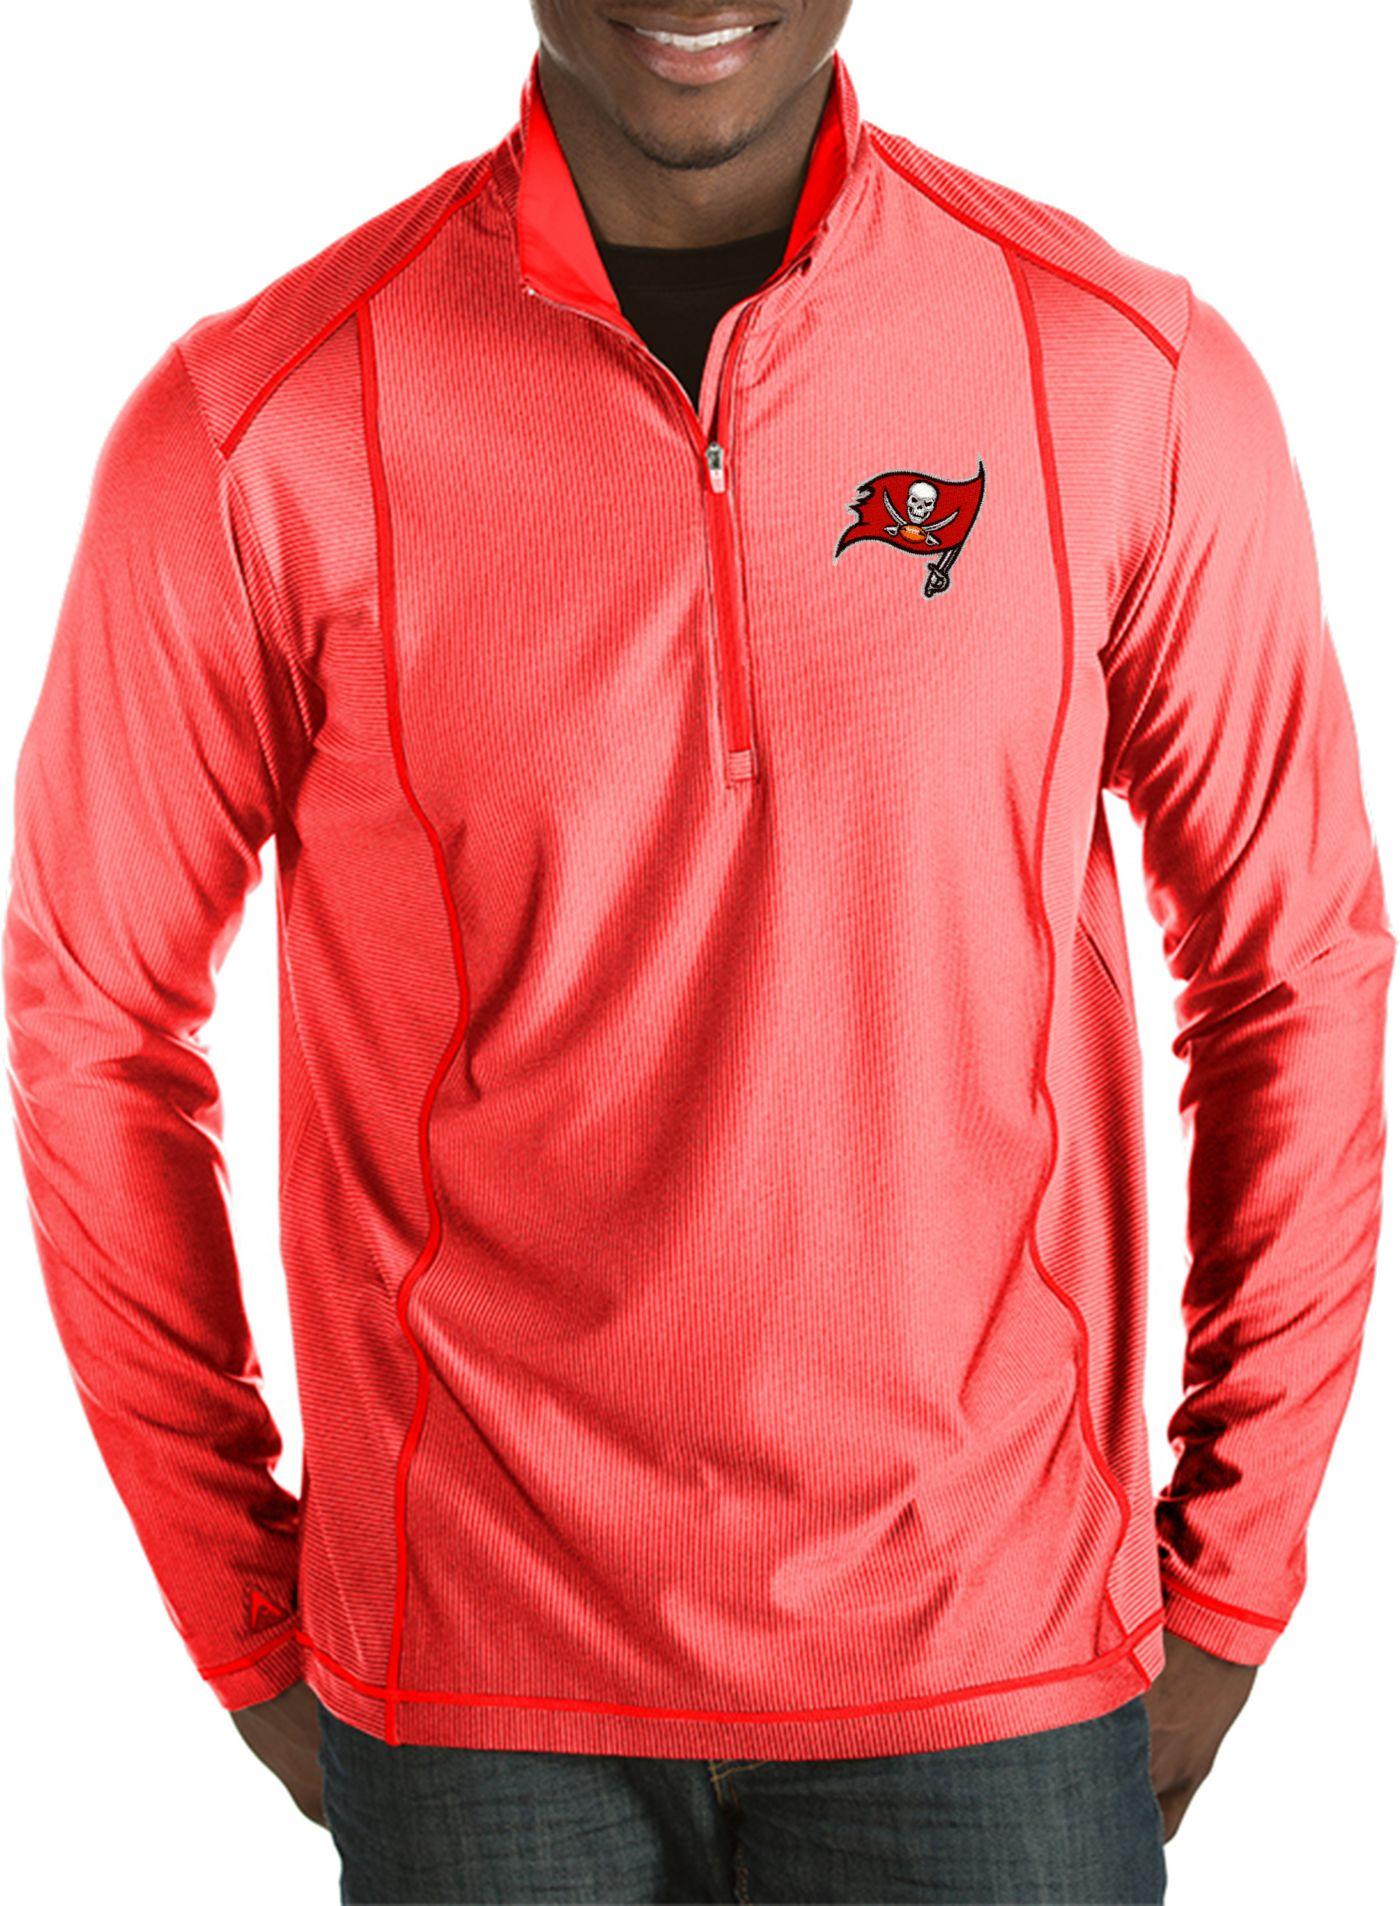 Antigua Men's Tampa Bay Buccaneers Tempo Red Quarter-Zip Pullover